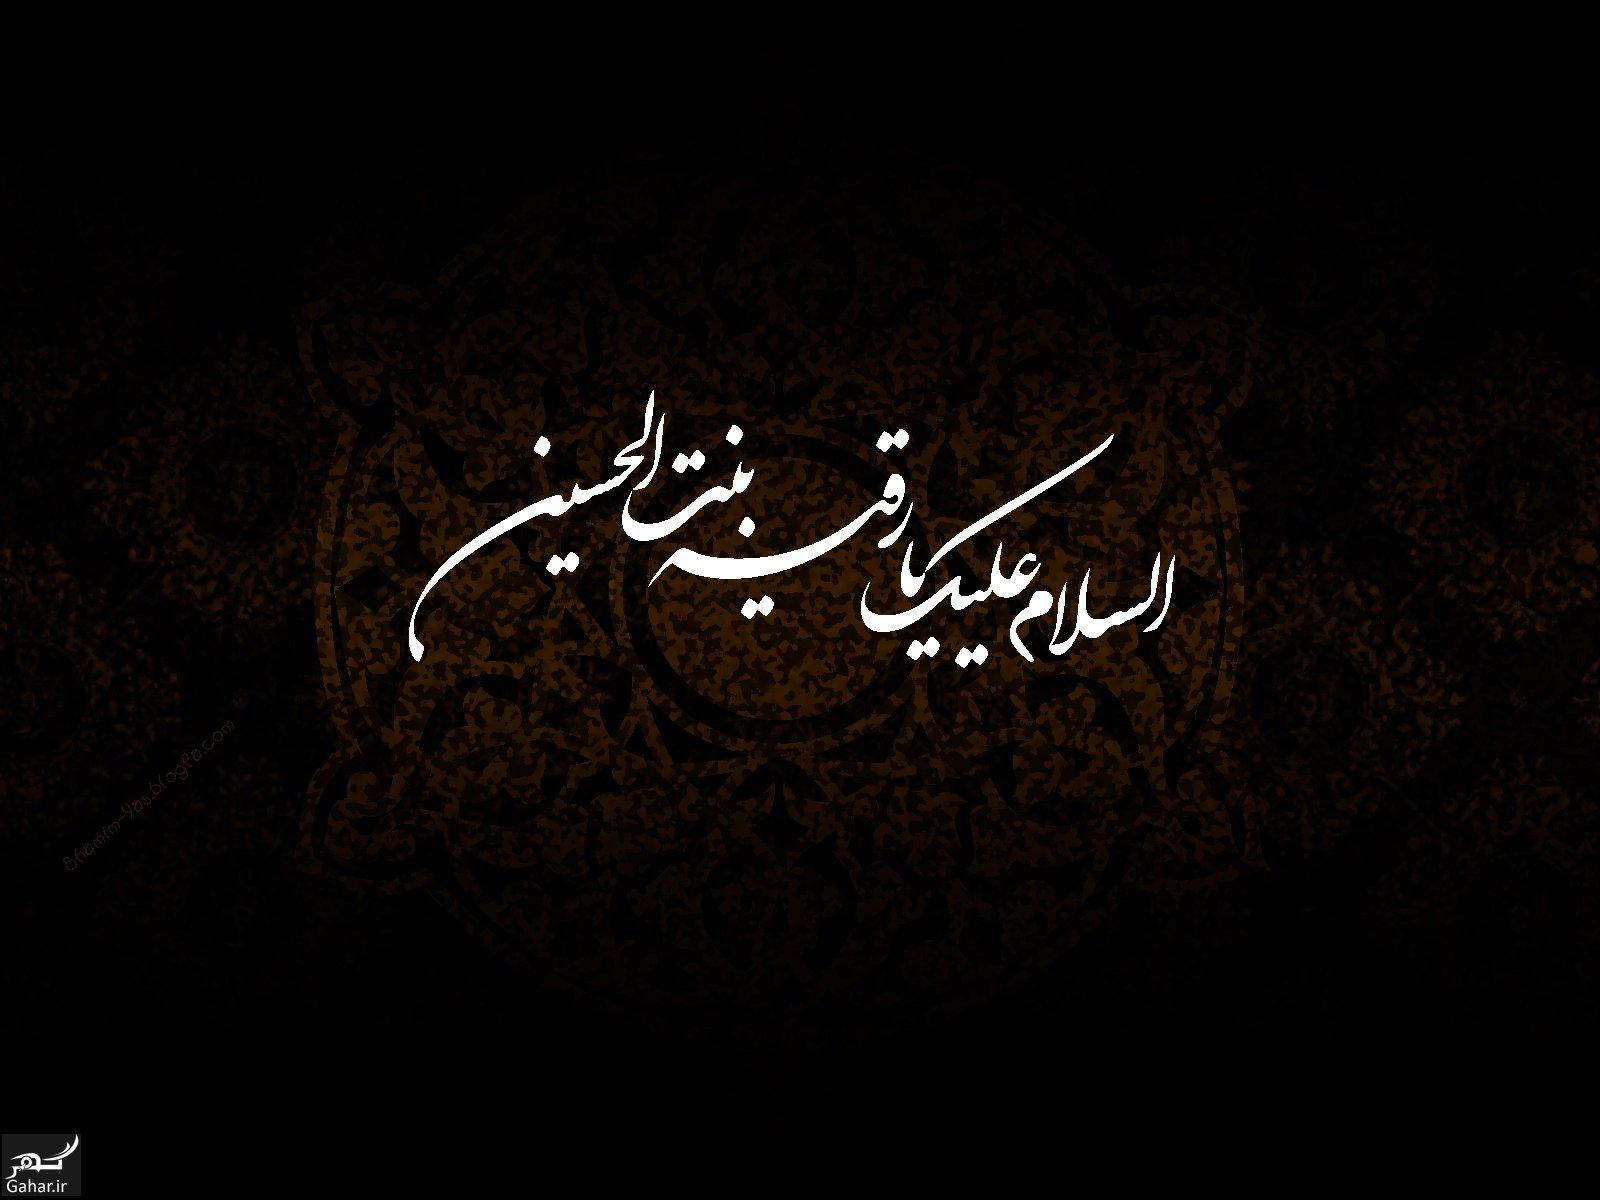 mataleb www.gahar .ir 28.06.97 5 کرامات و معجزات حضرت رقیه (س)